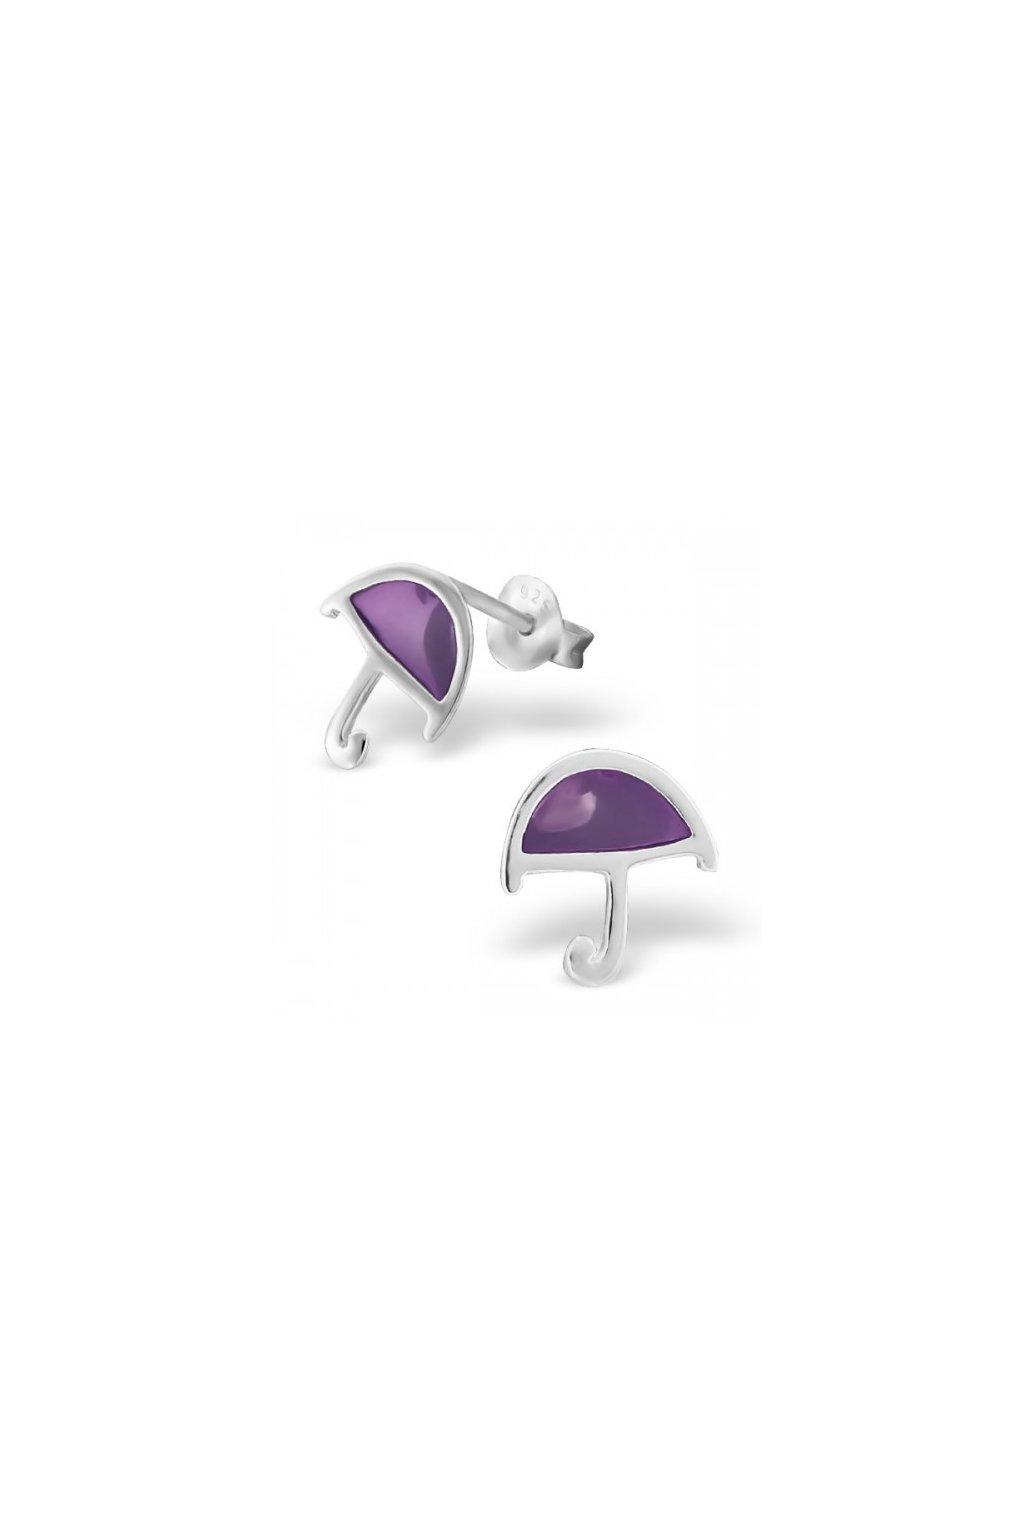 Strieborné náušnice dáždniky- 925 fialová epoxidová farba MS16185